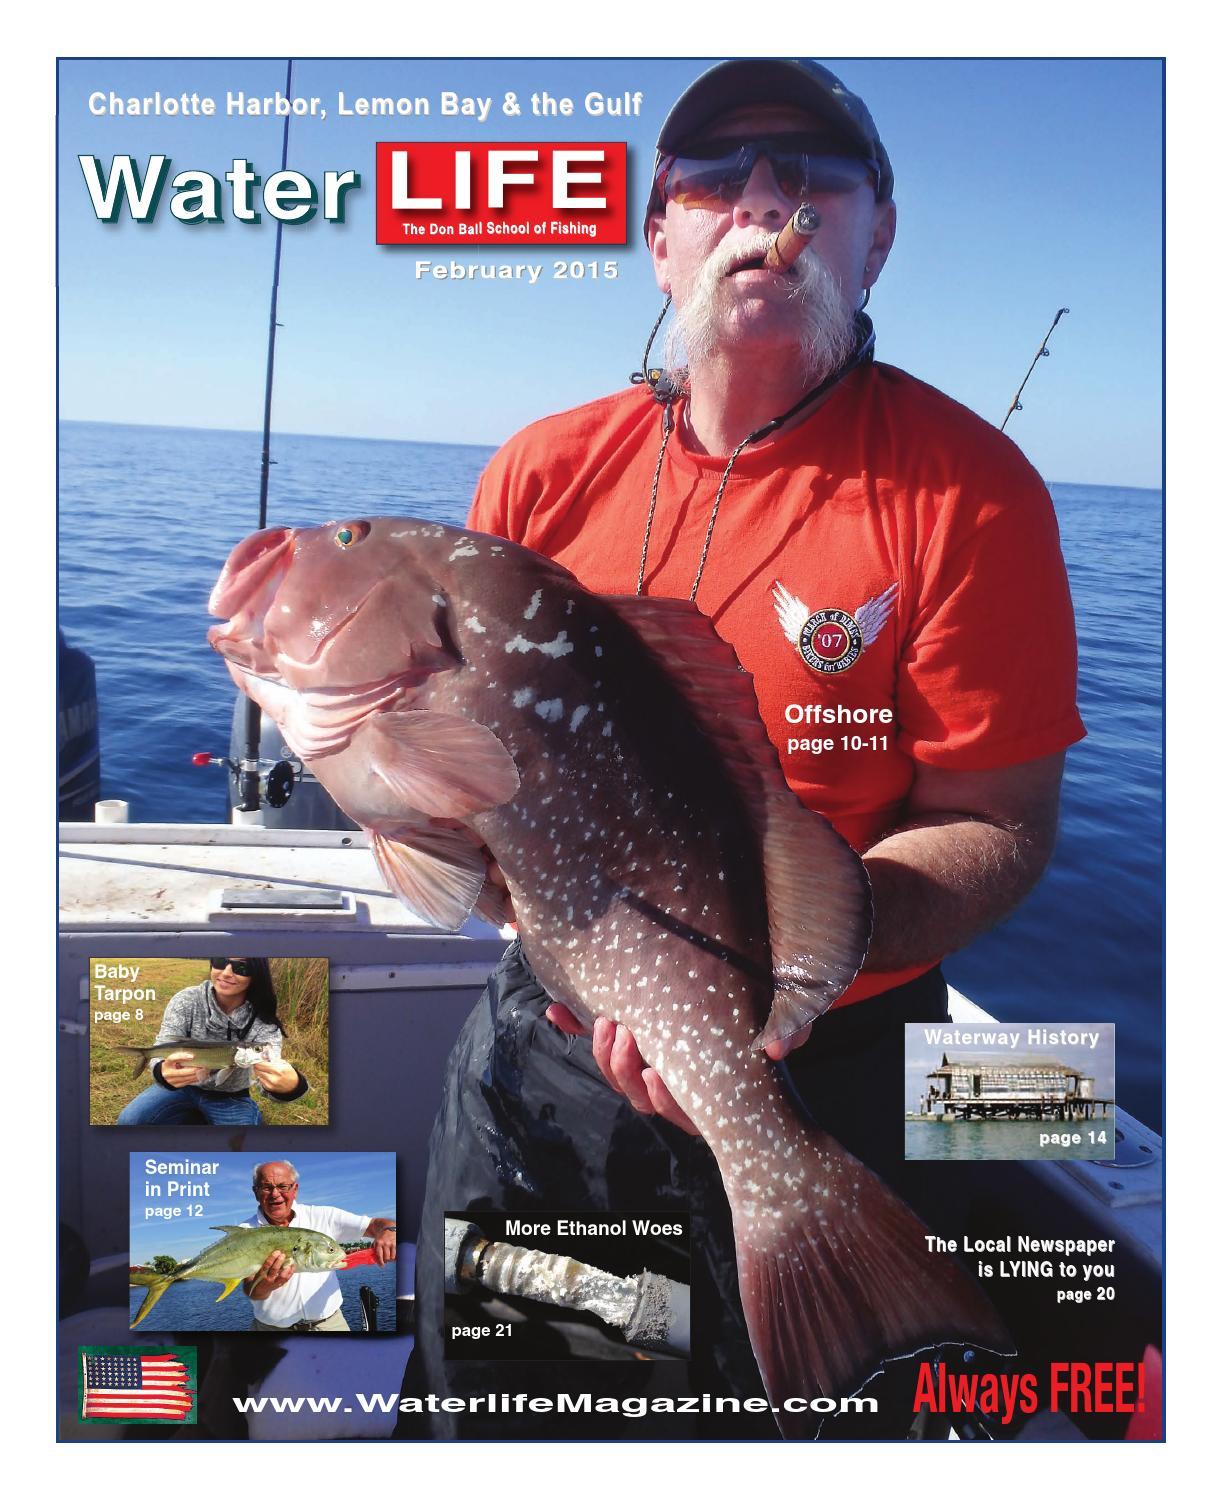 5d51b9ebb31d29 Water LIFE Feb 2015 by Water LIFE magazine - issuu